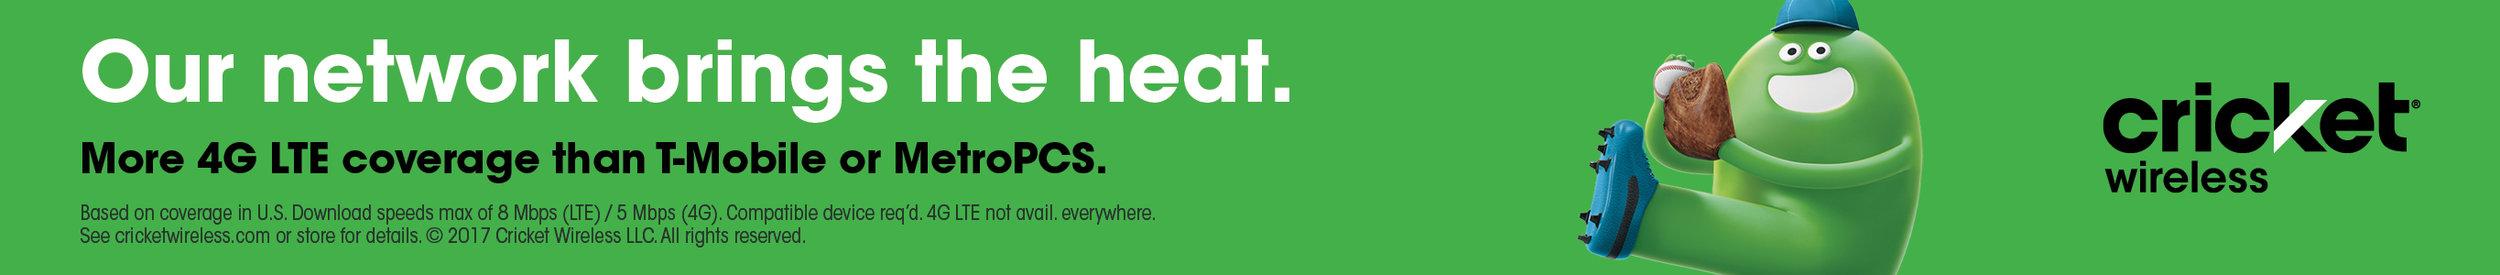 dante-brings-the-heat-local.jpg